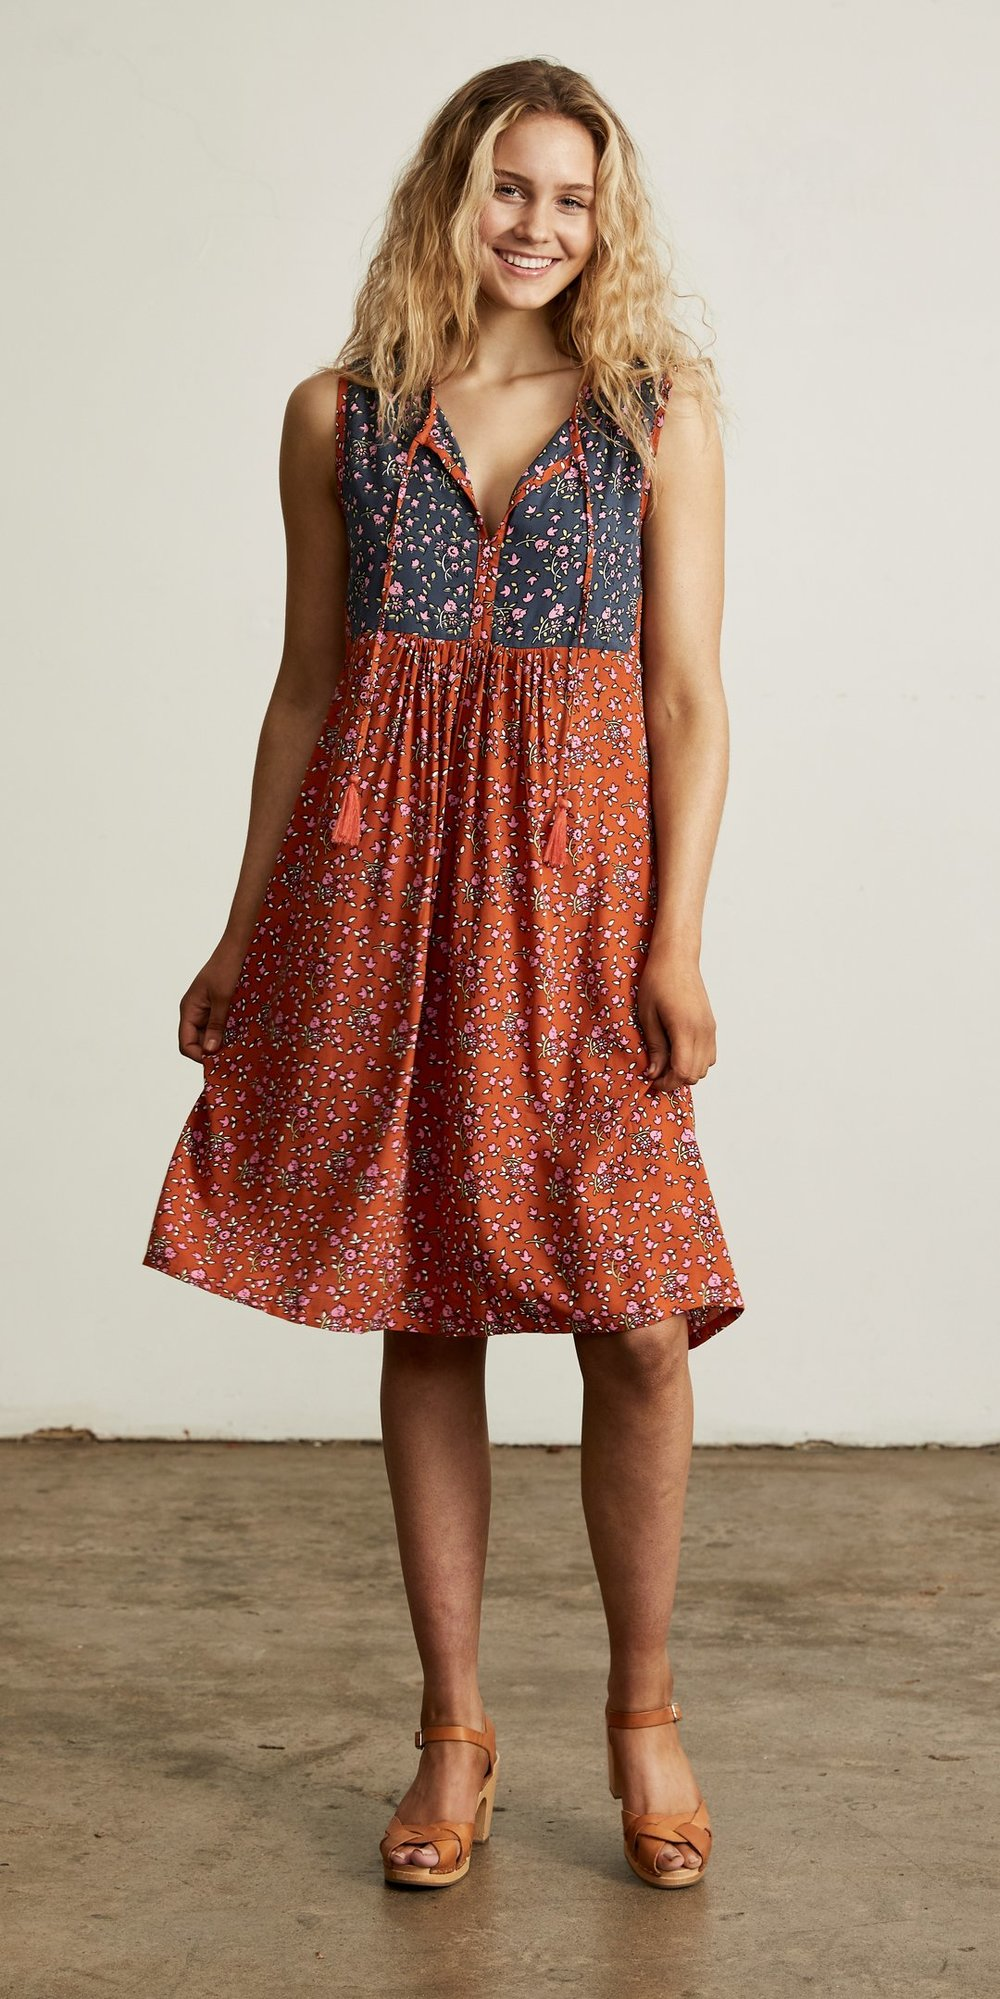 Charlie Boho Dress Ethically Made Bali.jpg